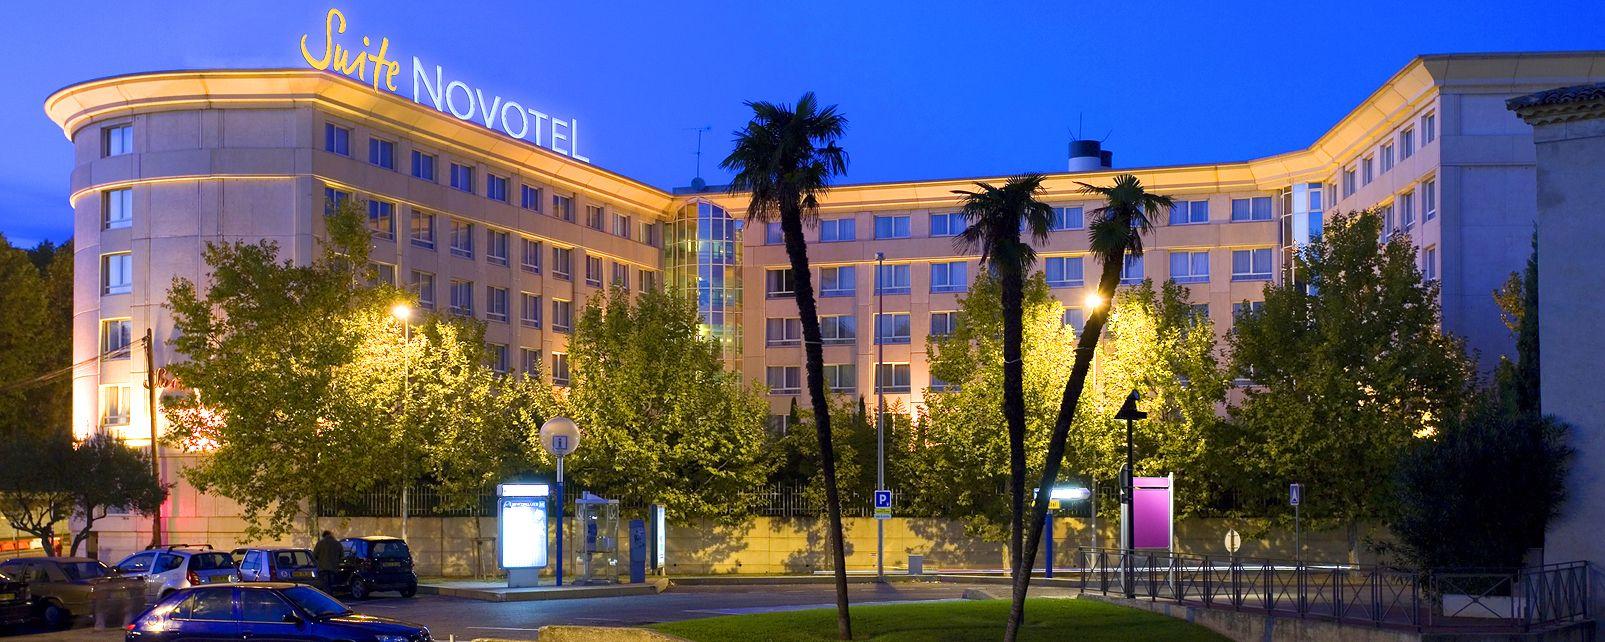 Hôtel Suite Novotel Montpellier